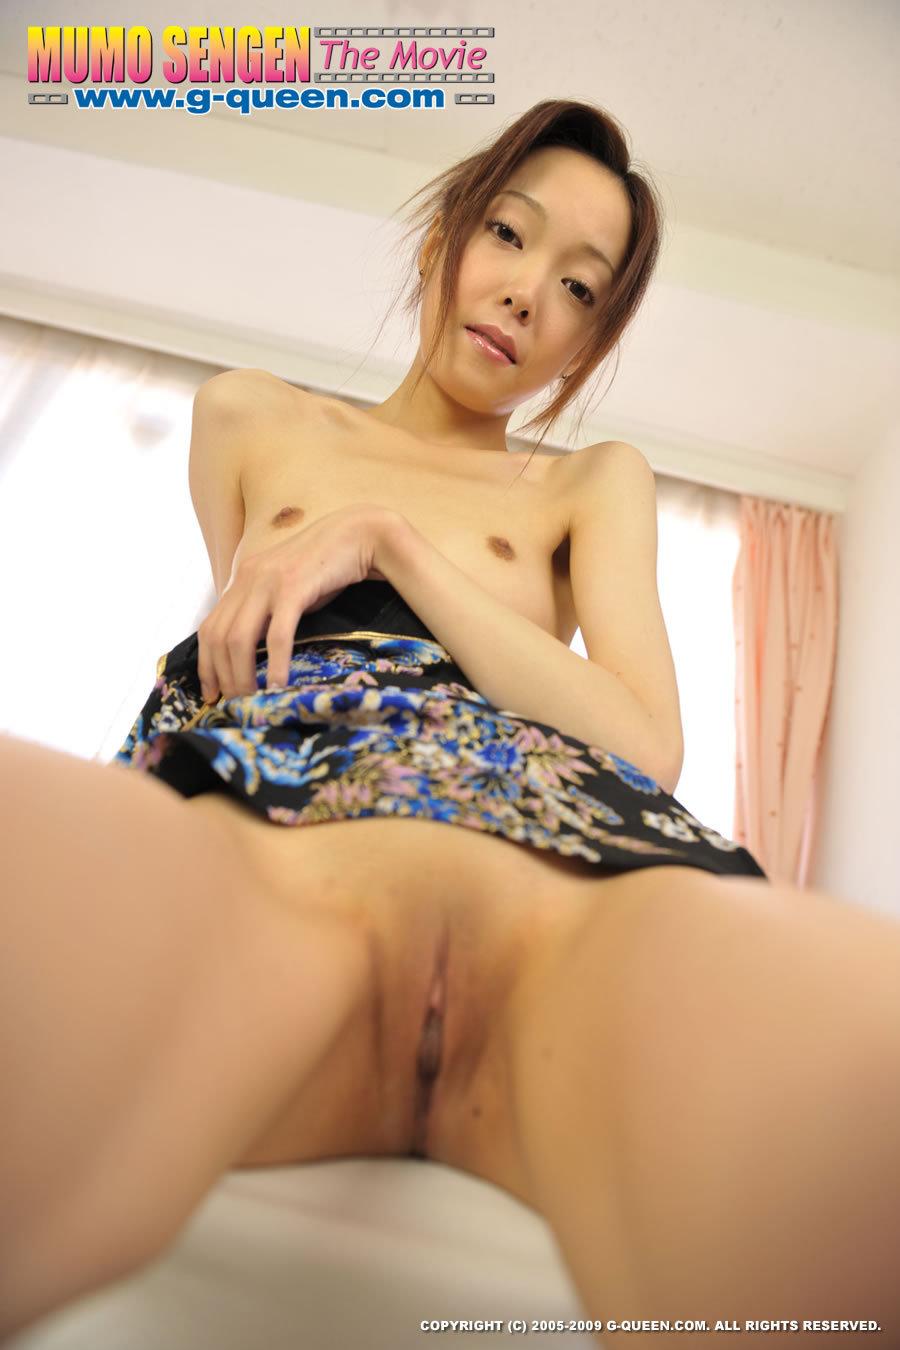 Super sexy naked women big tits